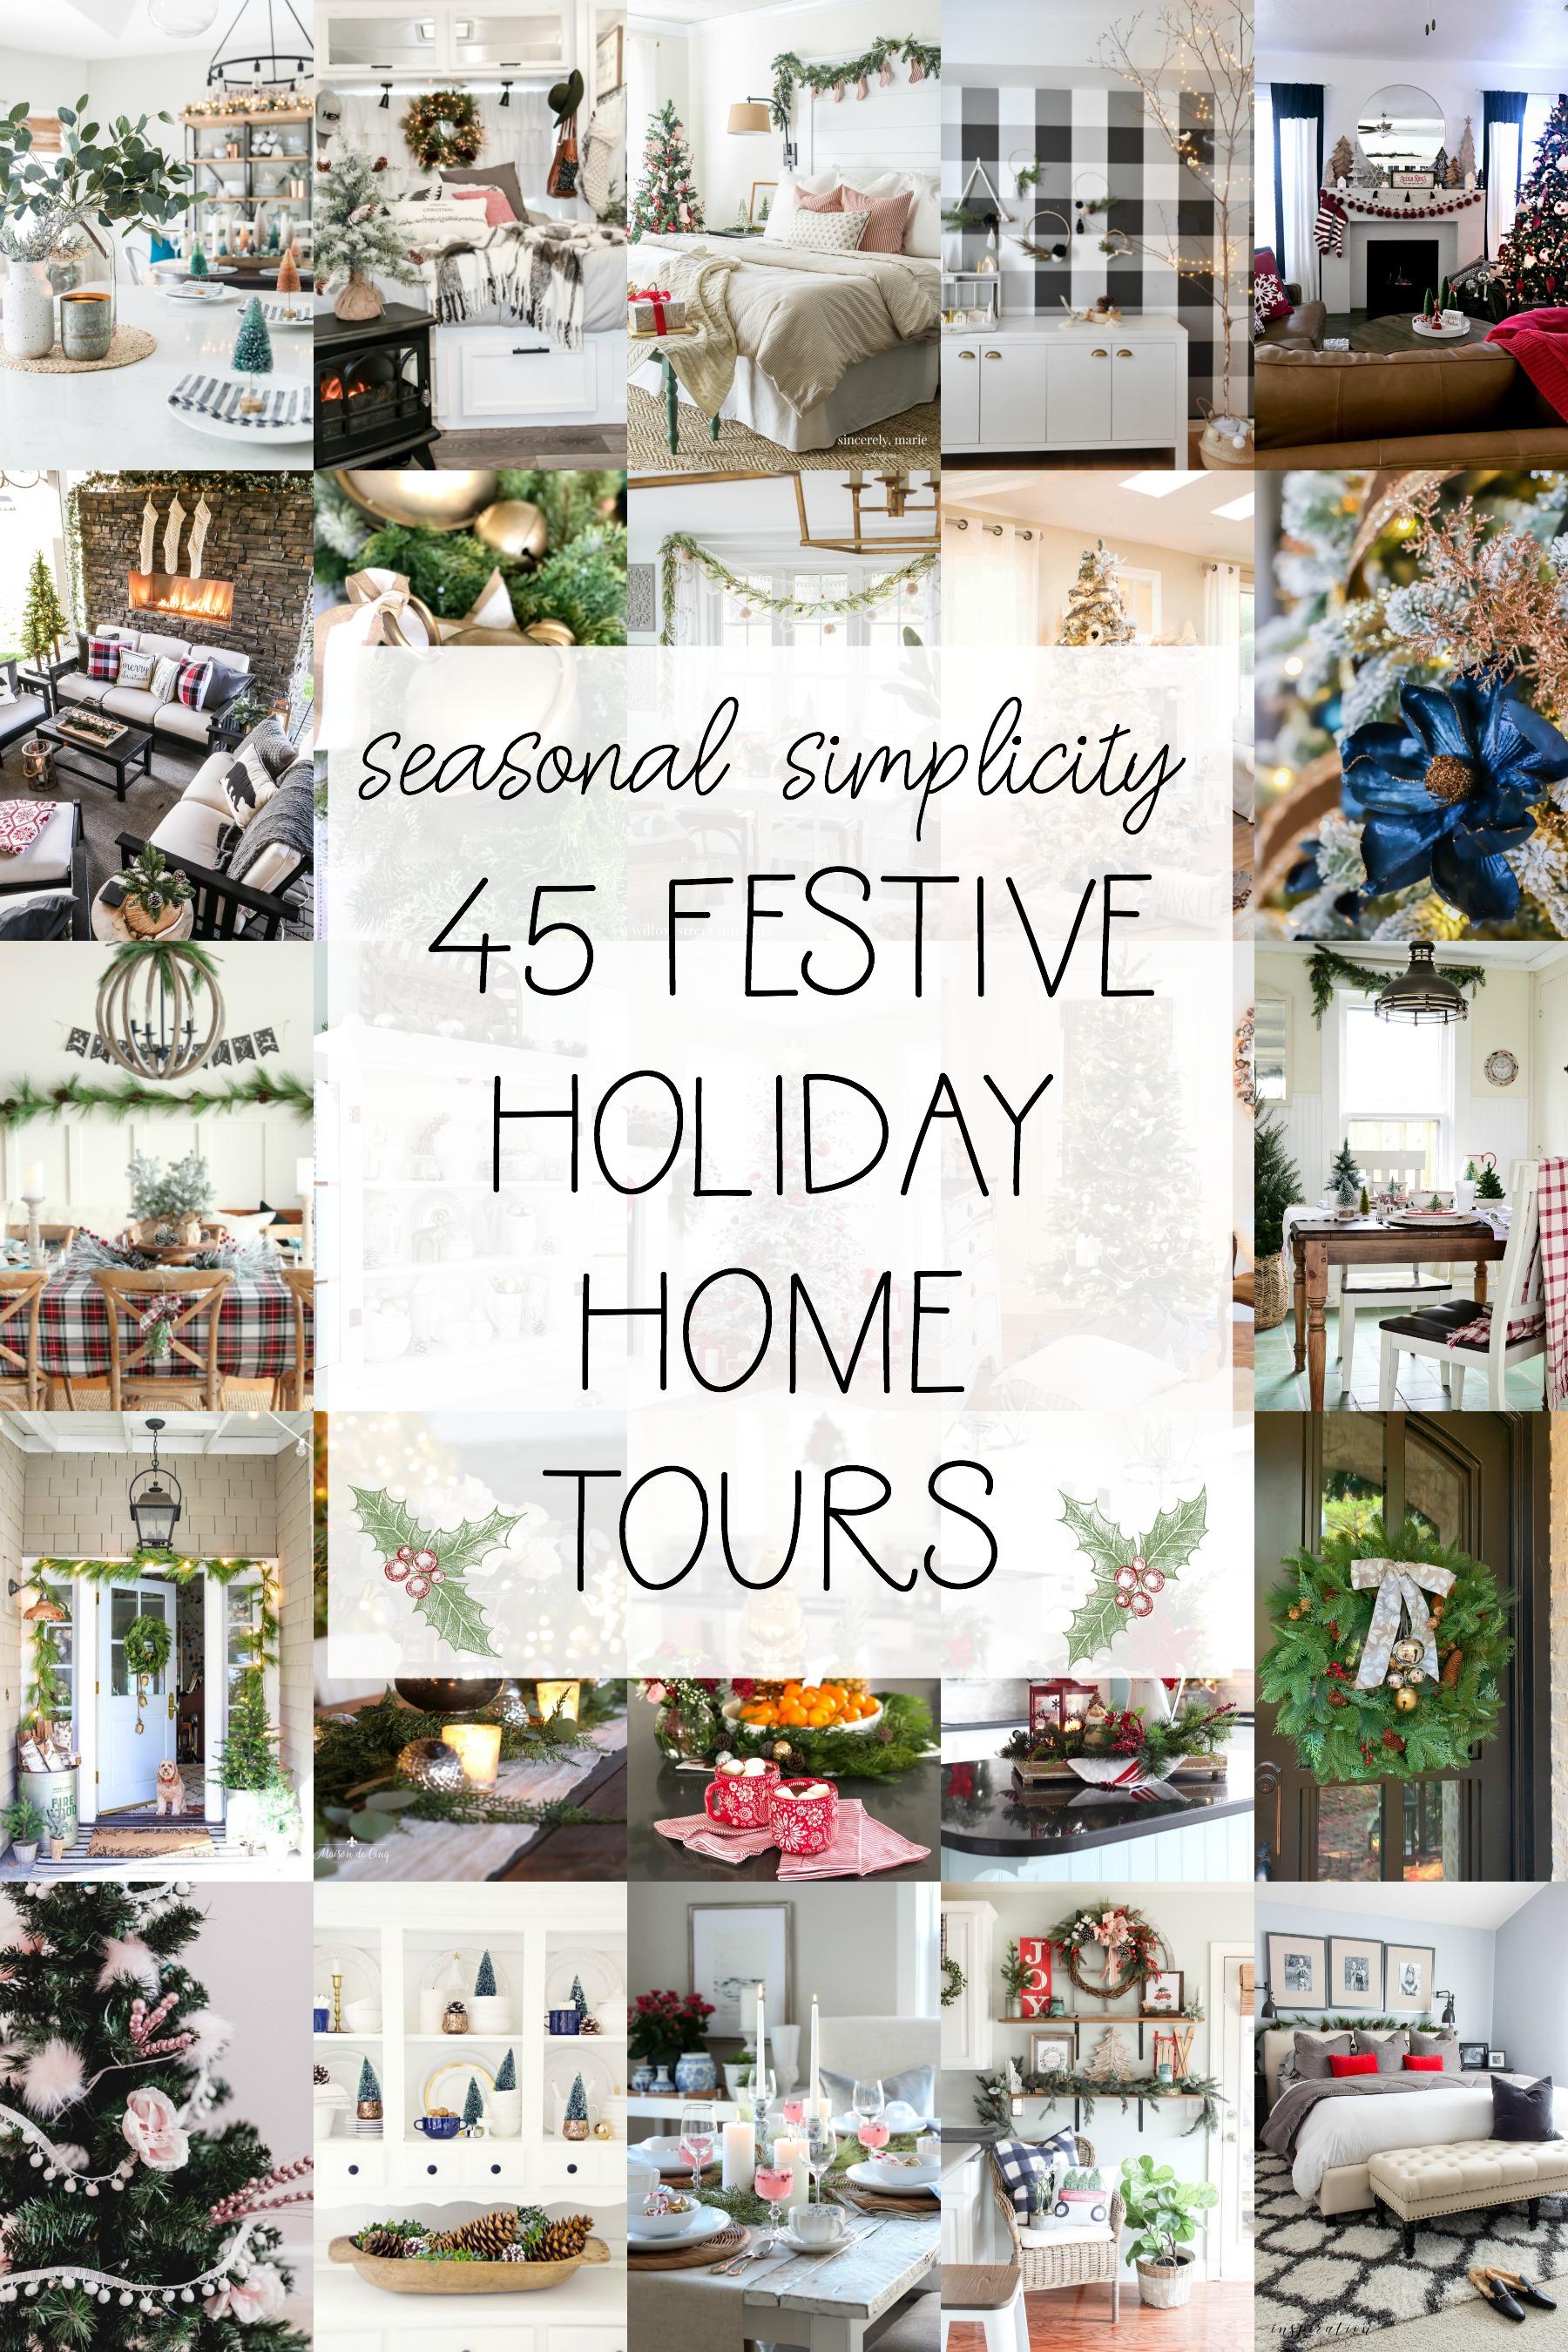 Seasonal simplicity 45 festive holiday home tours